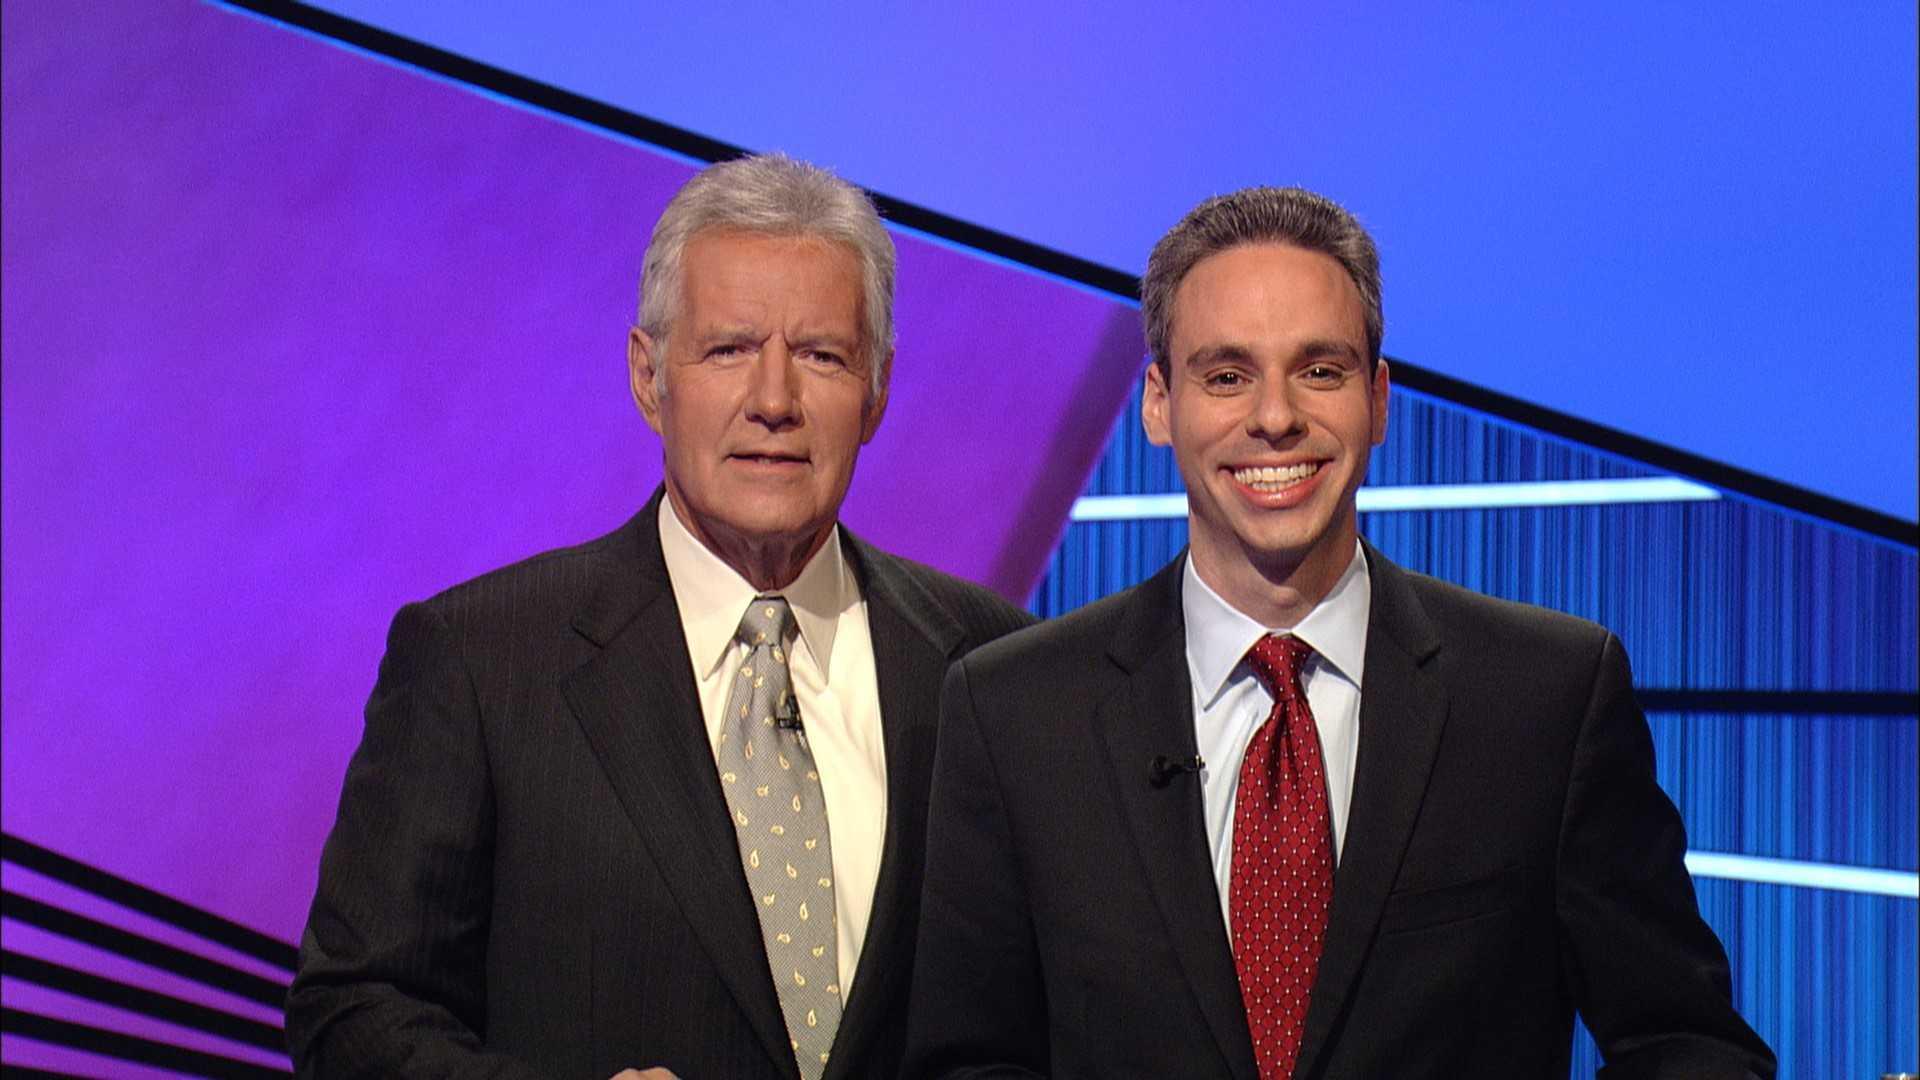 Boca Raton mayor remembers 'Jeopardy!' host Alex Trebek